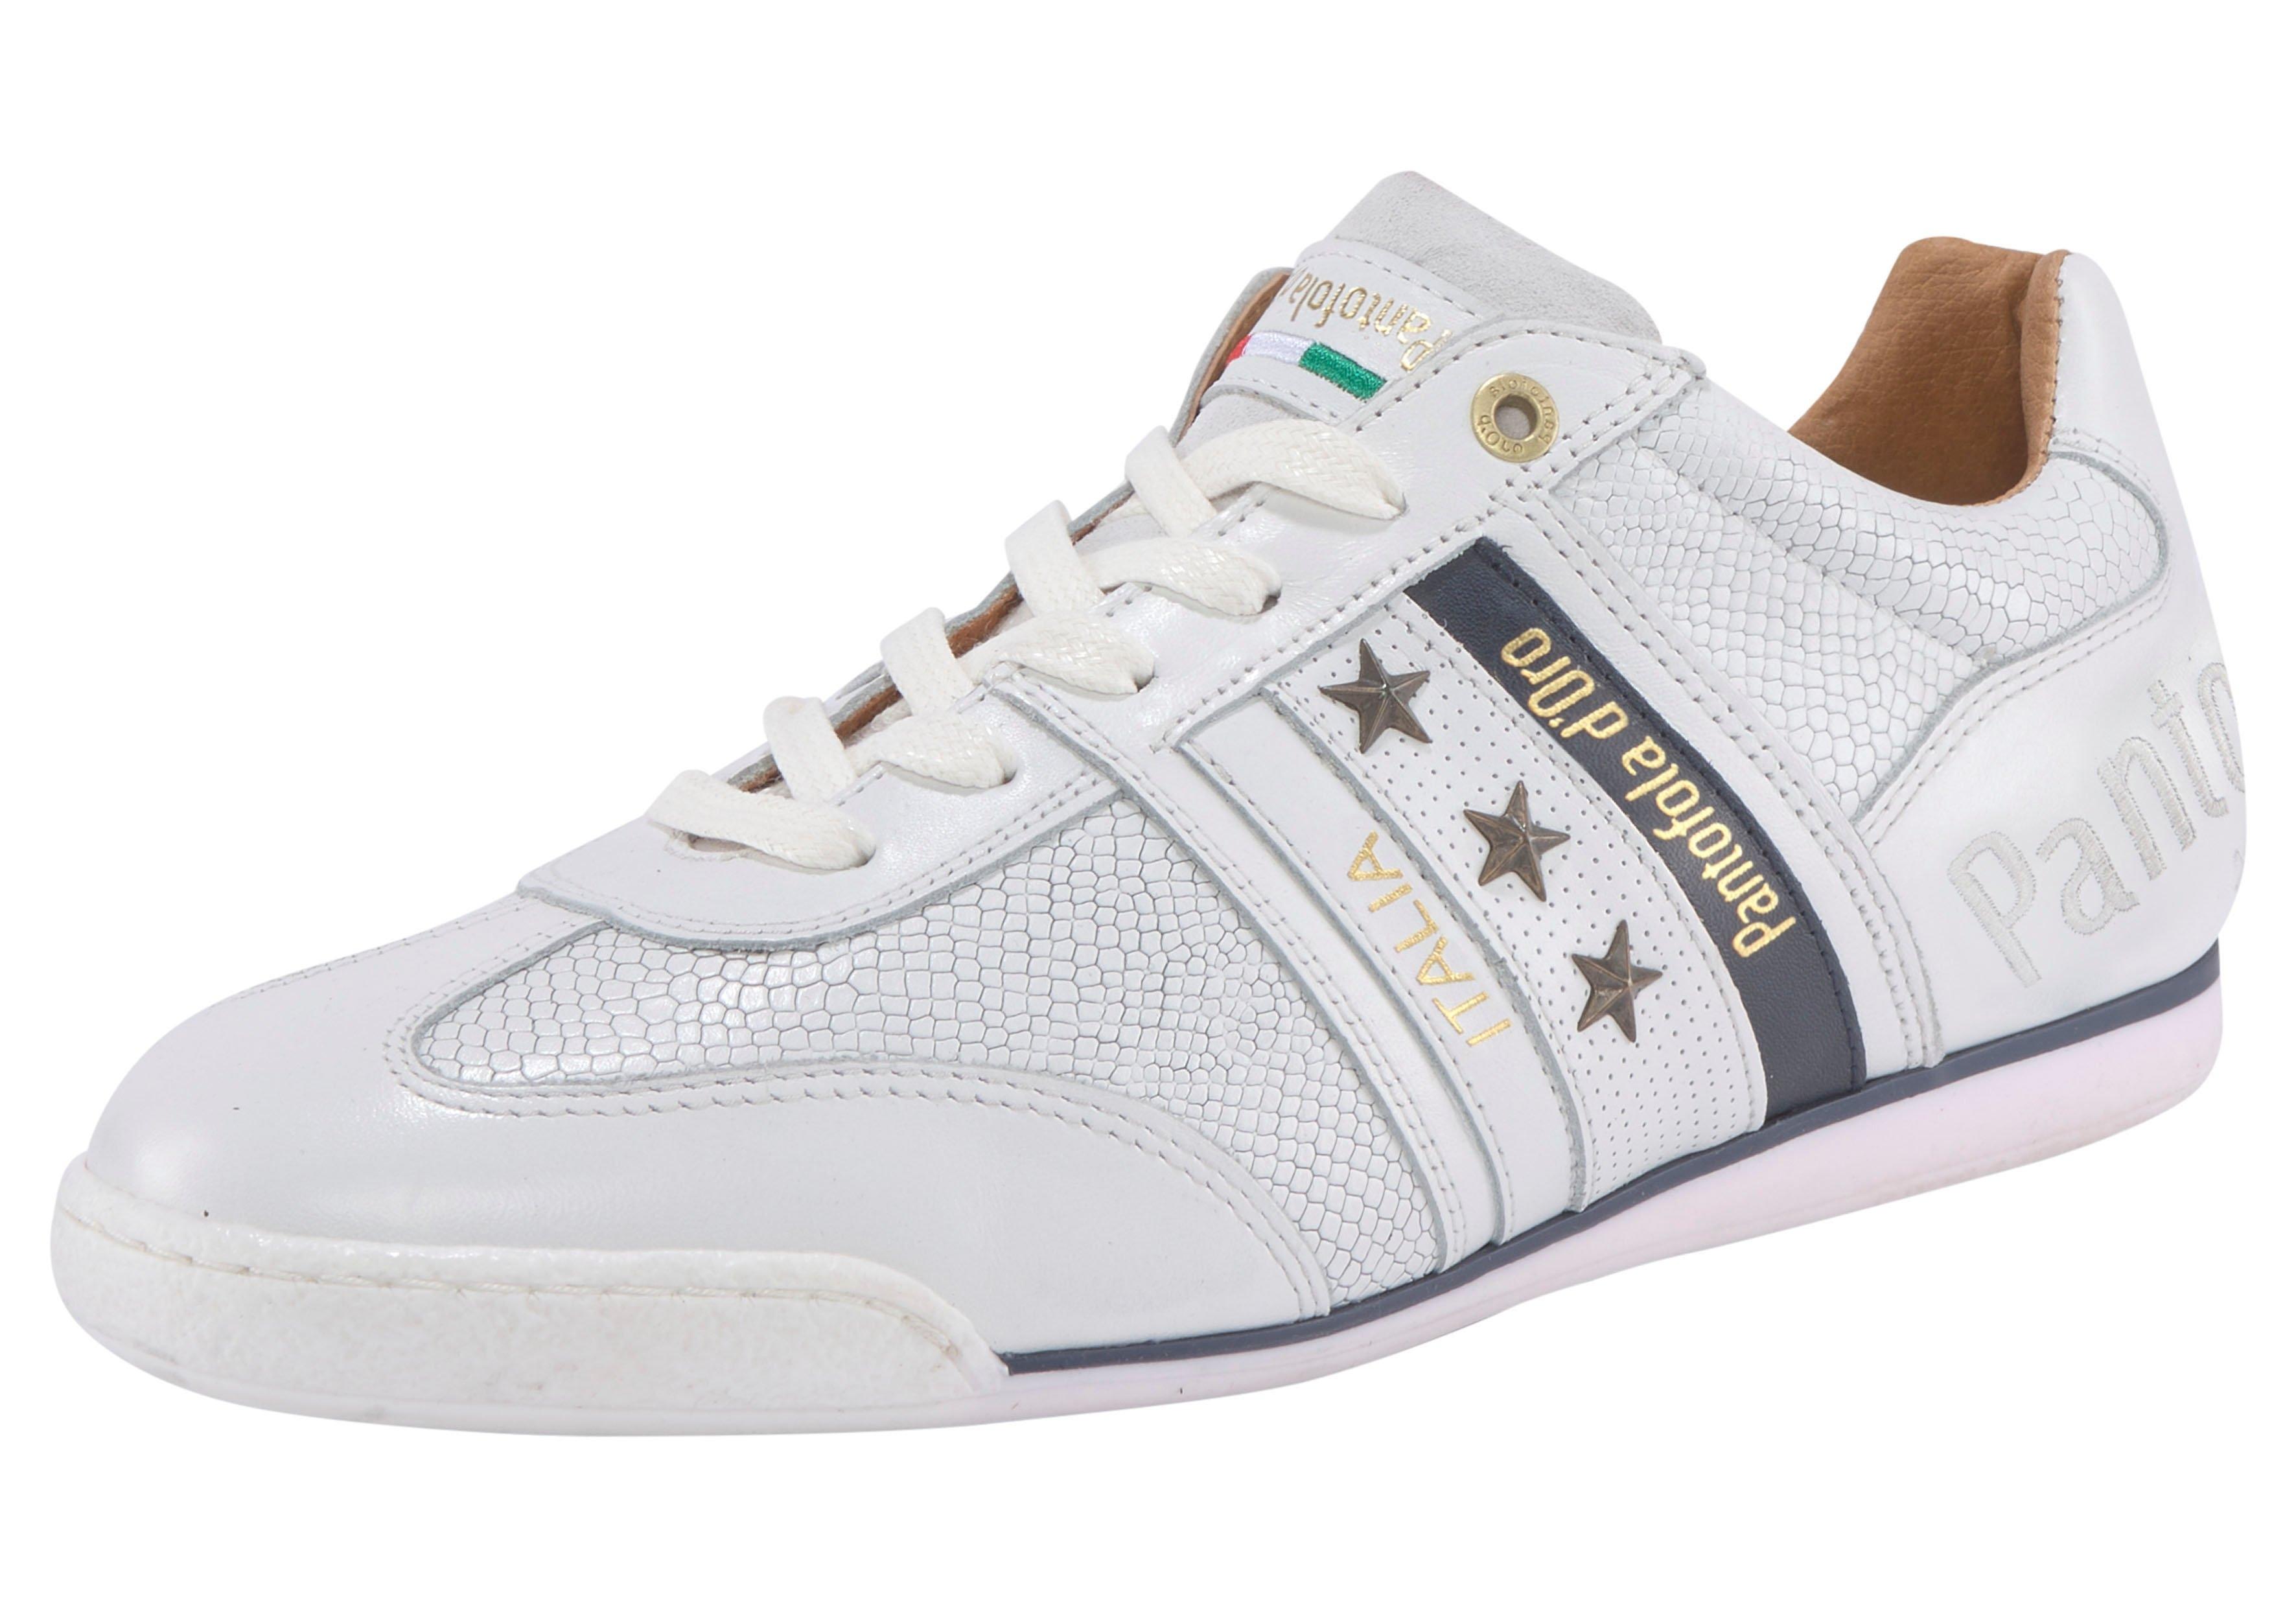 Pantofola d´Oro sneakers Imola Stampa Uomo Low goedkoop op otto.nl kopen